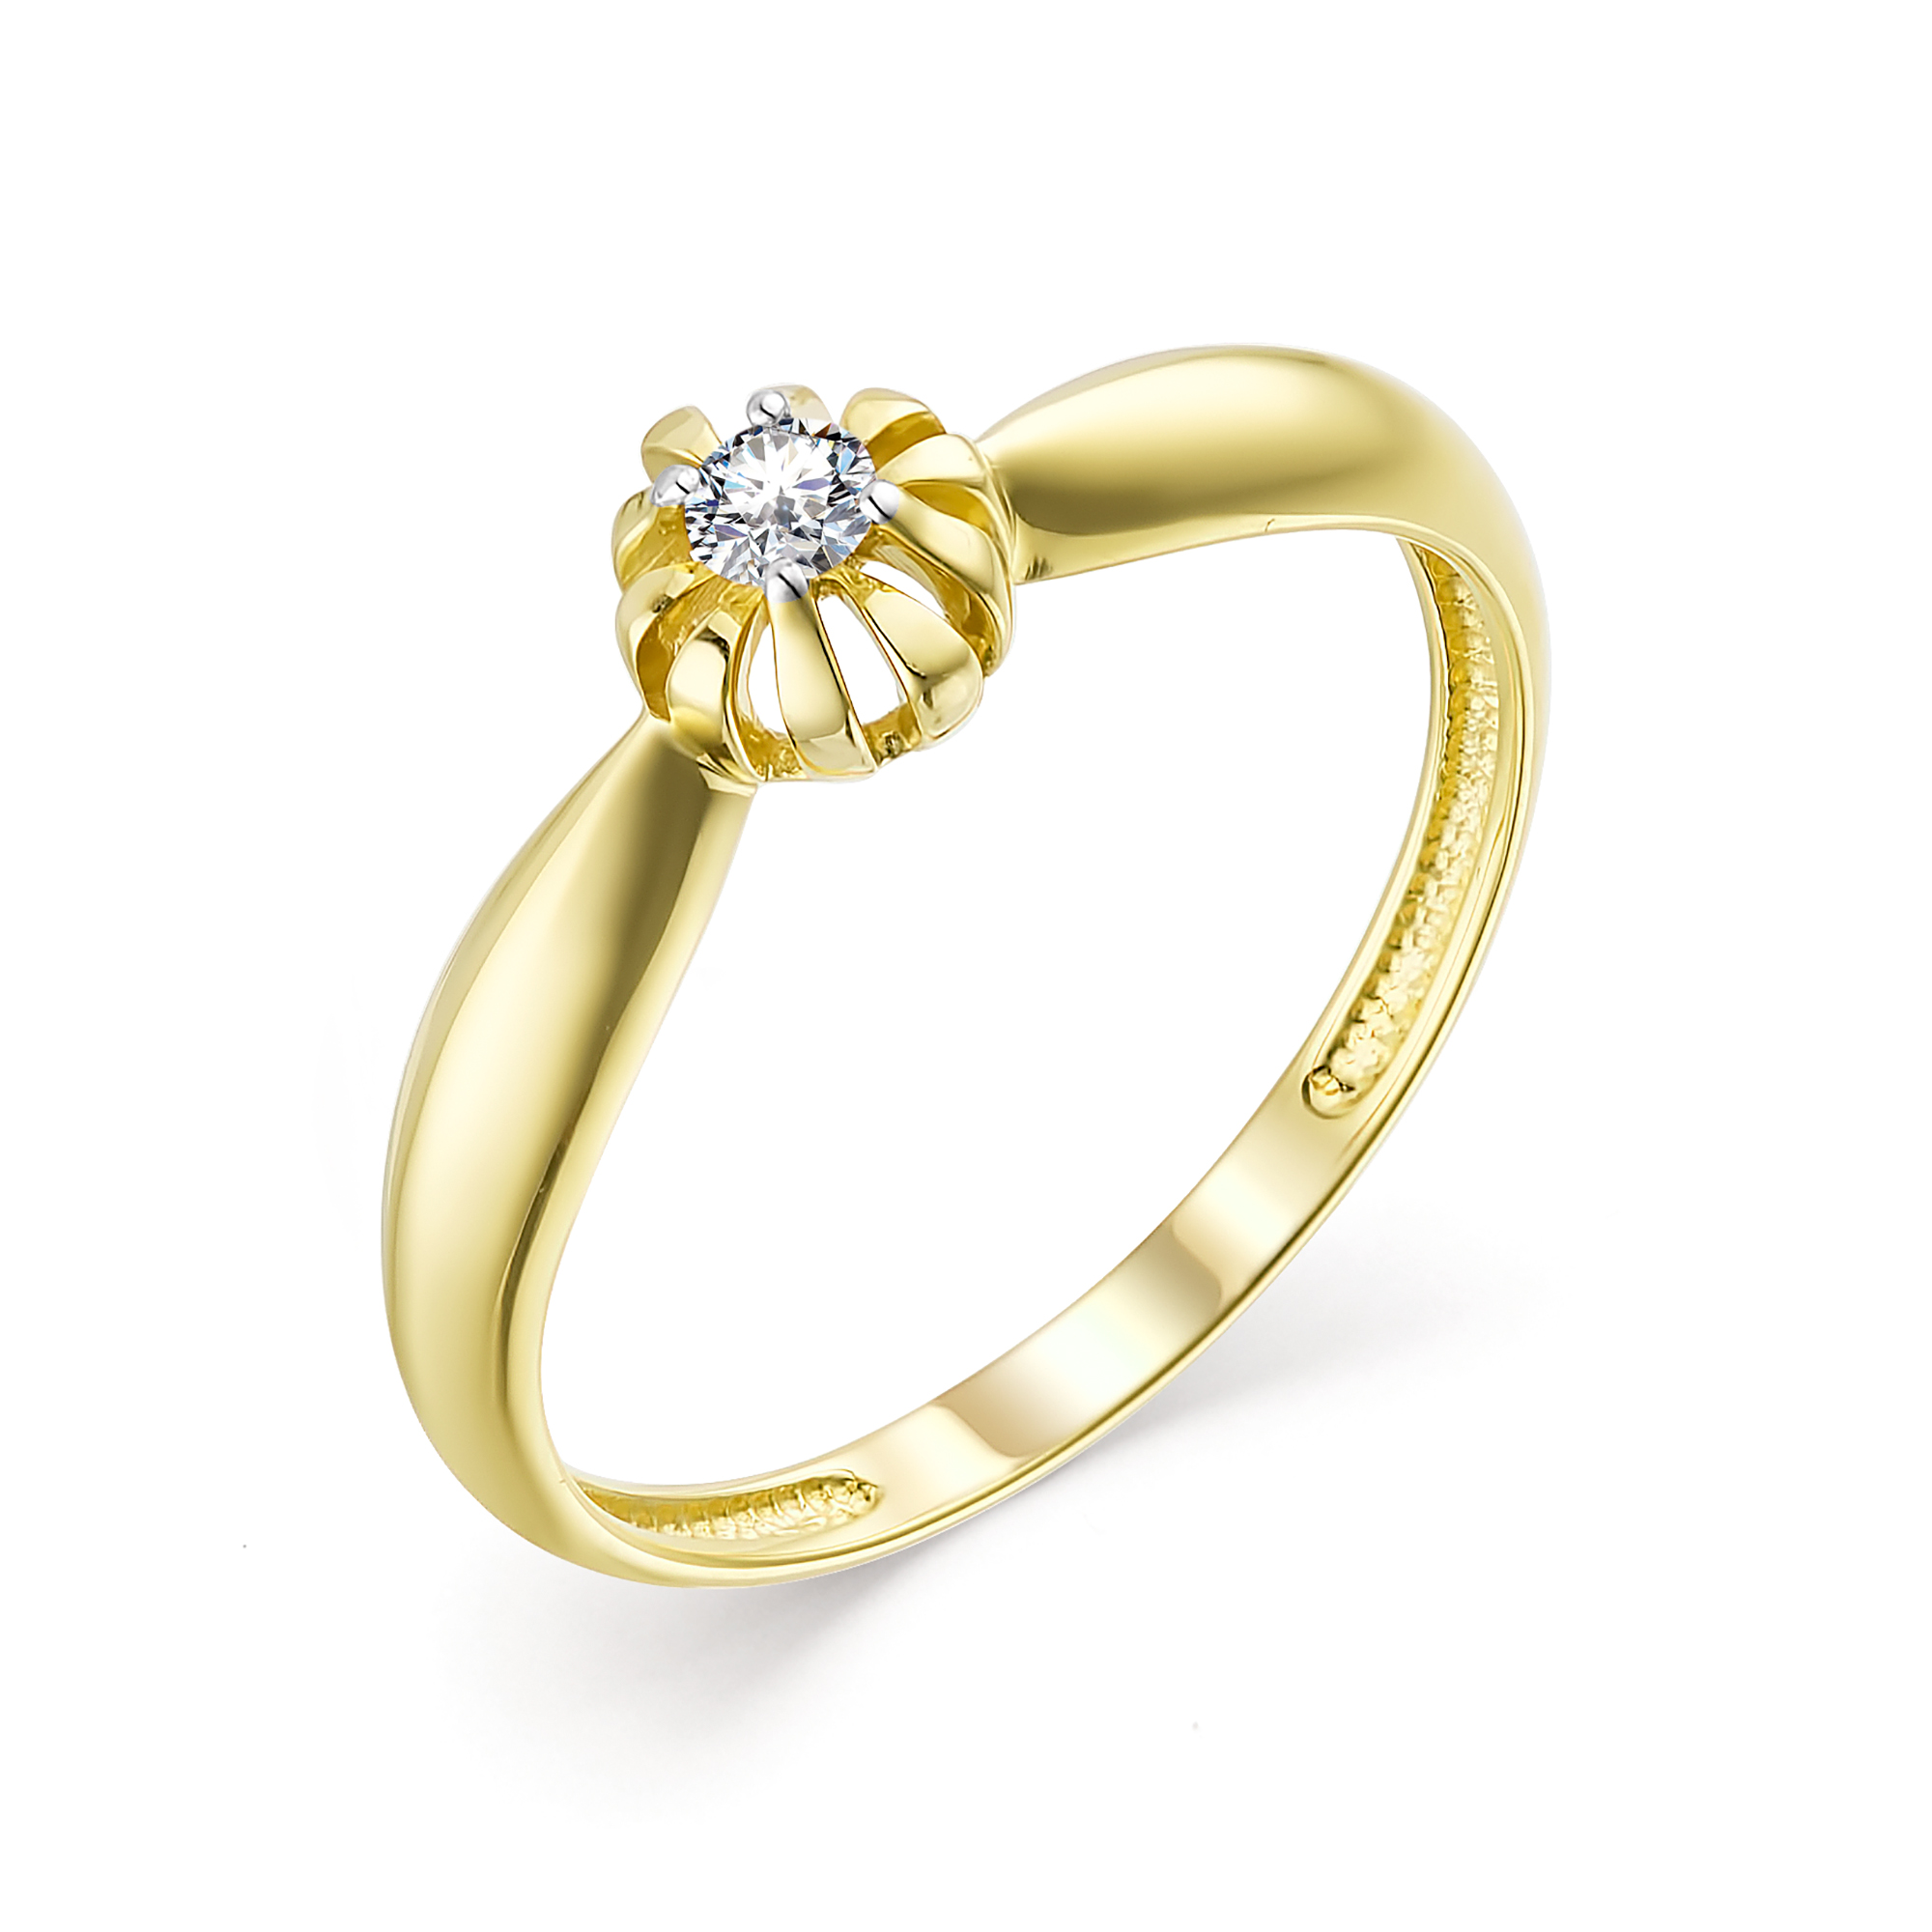 картинка кольцо 13512-300 1 бриллиант круг 57 0,073 15-20 3/6а 13512-300